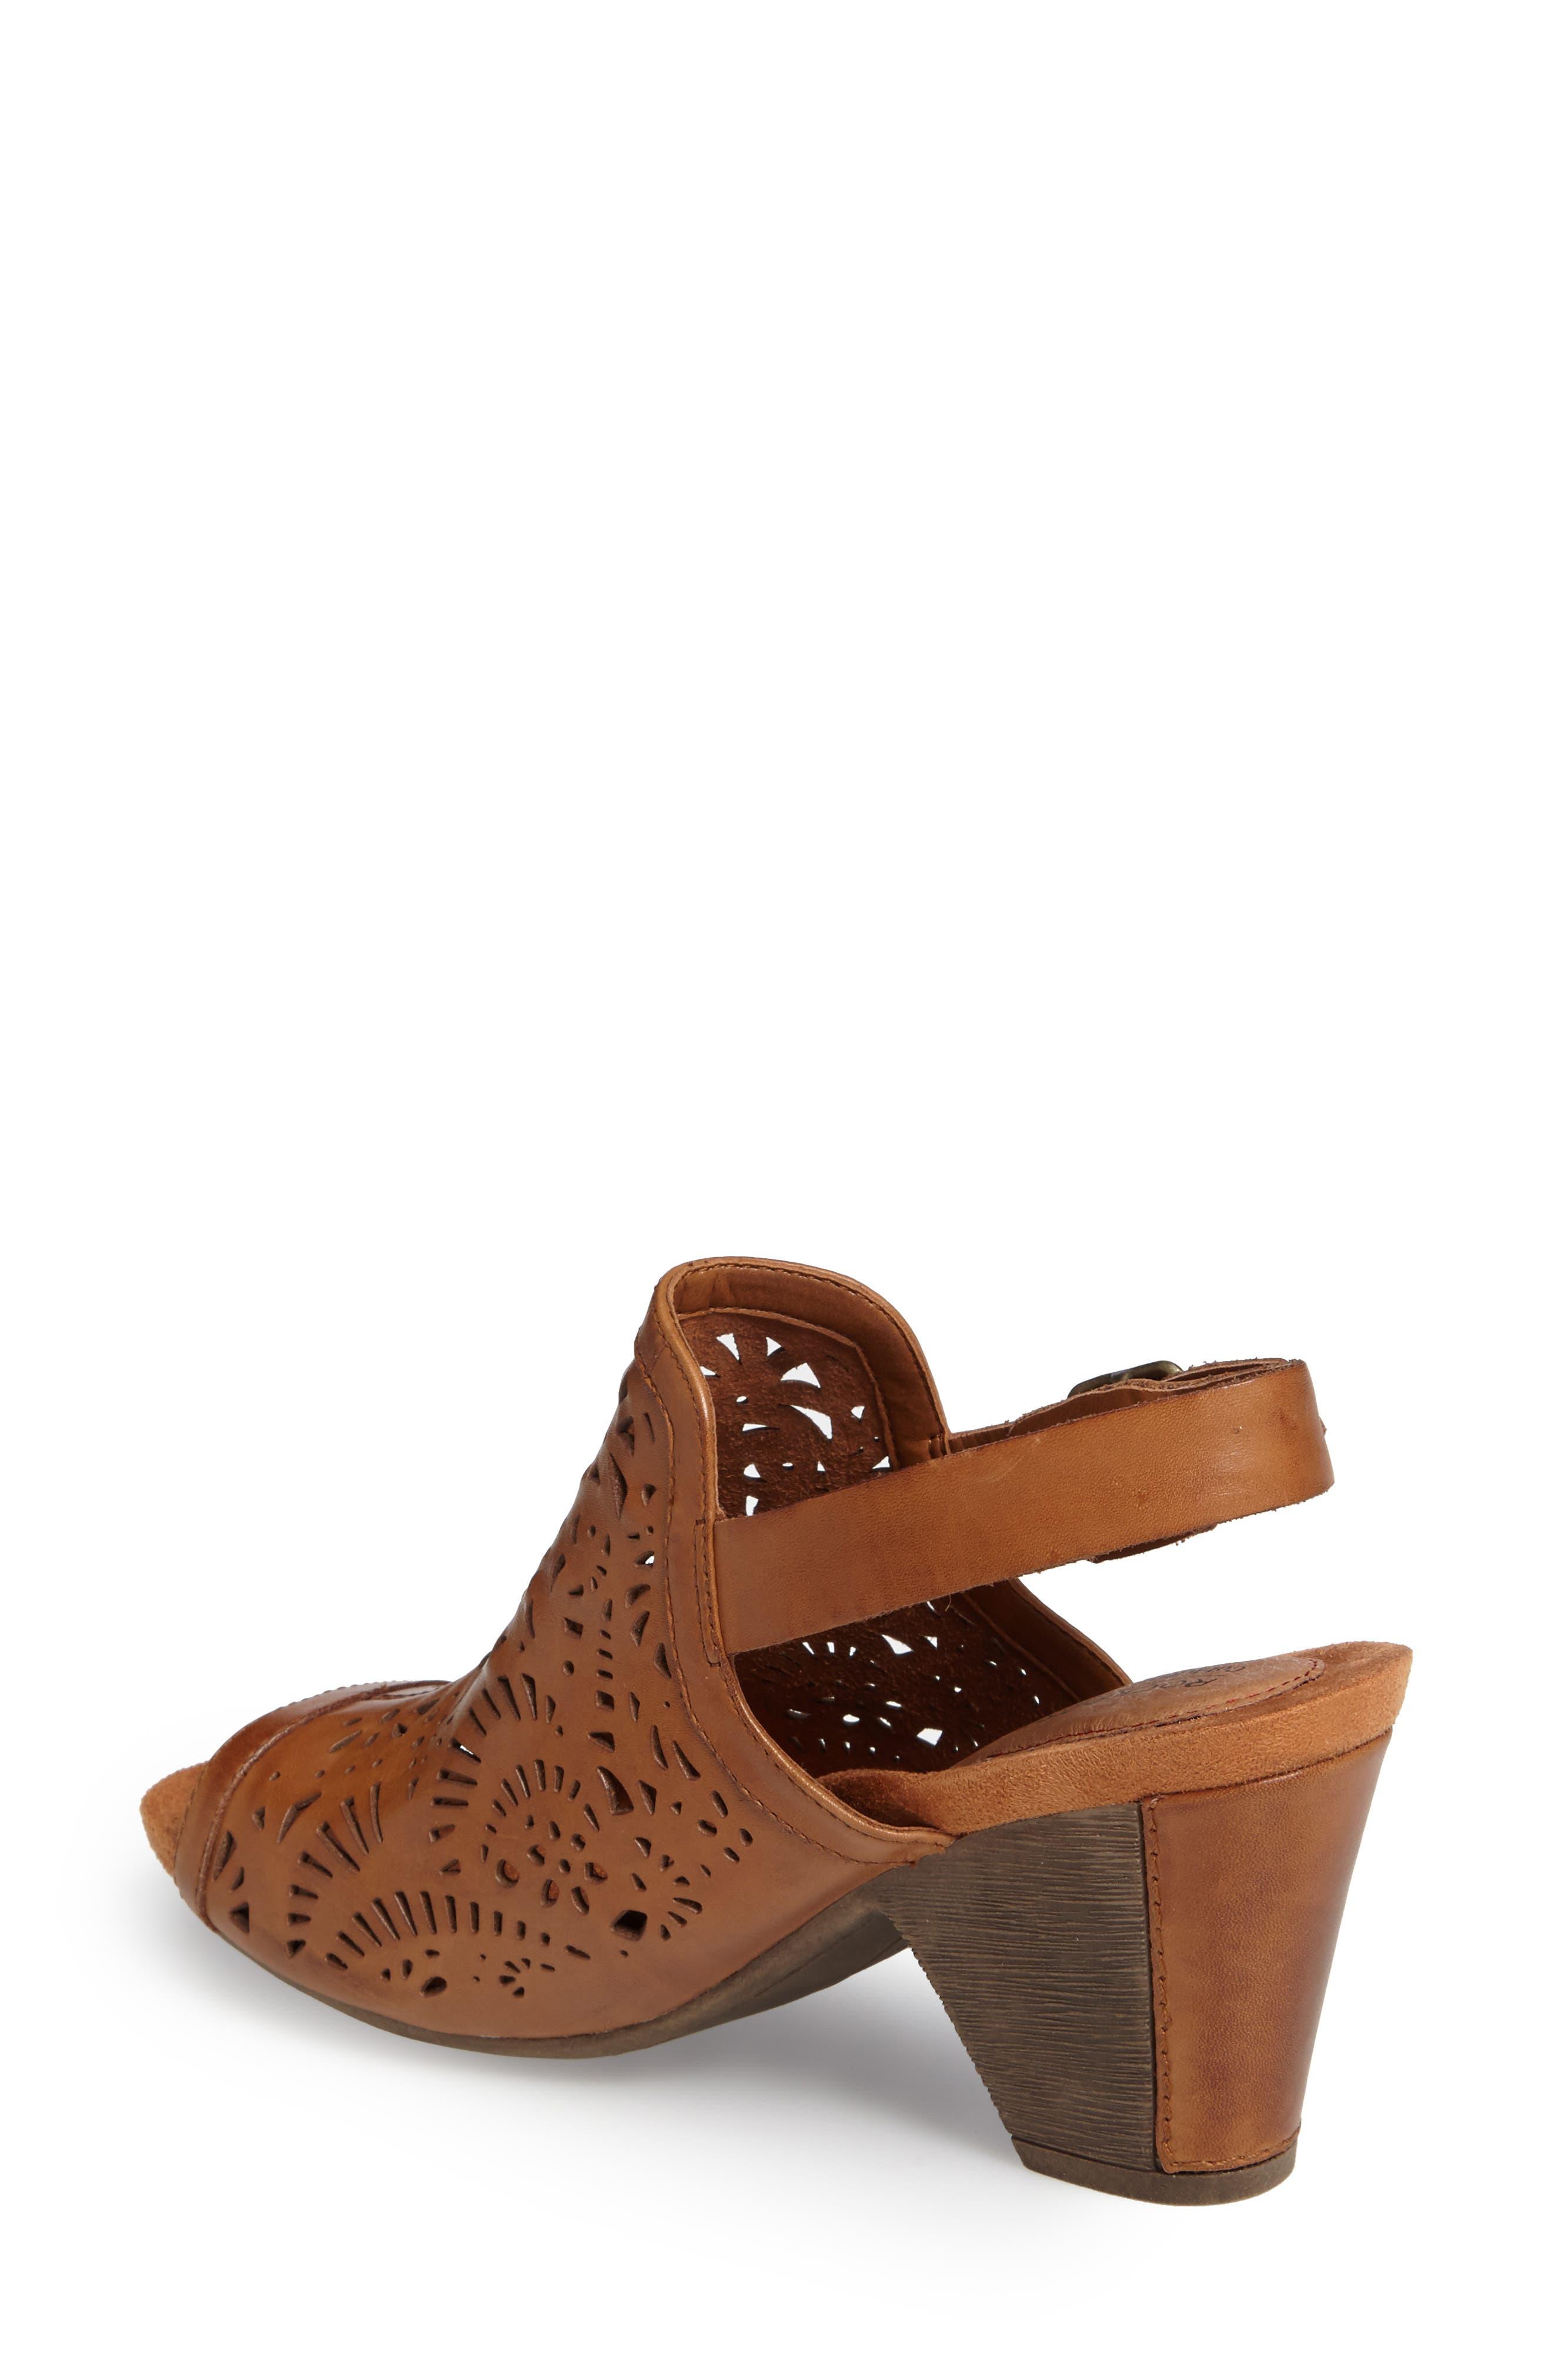 Tropez Block Heel Sandal,                             Alternate thumbnail 7, color,